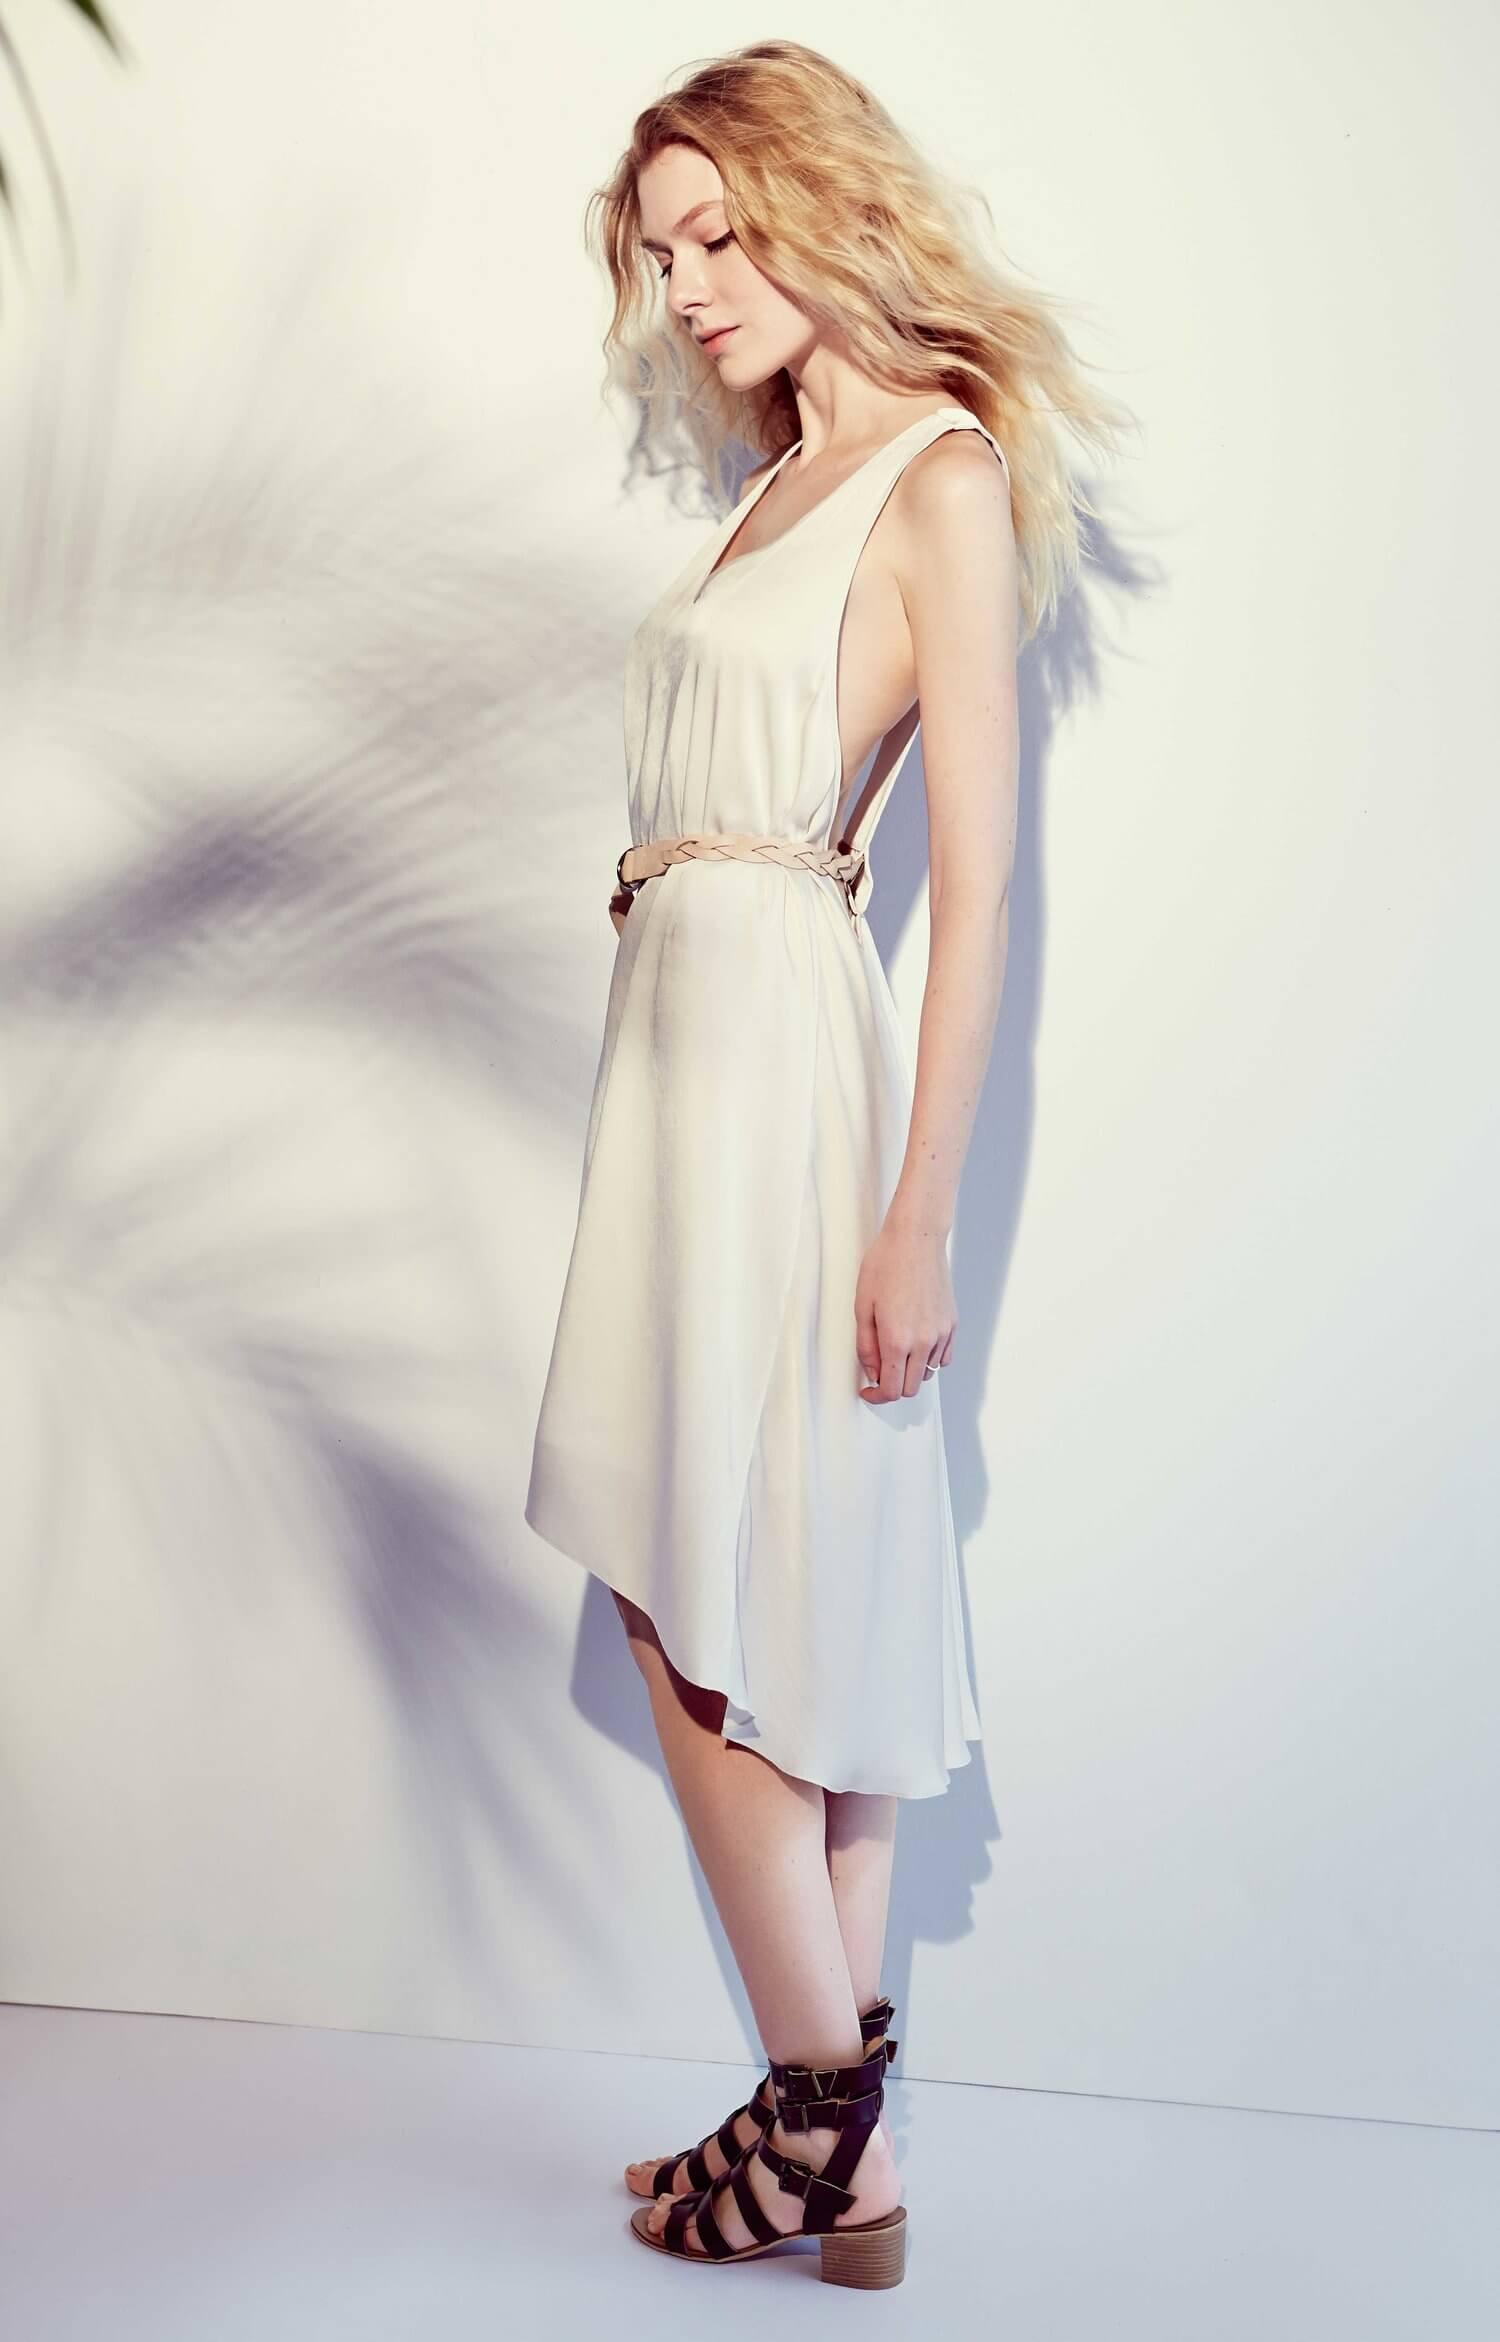 ruelala-art-direction-fashion-photography-model-modeling-ecommerce-shopping-onsite-website-designer-graphic-design-photo-photoshoot-shoot-photographer-stylist-onset-props-set-4.jpg